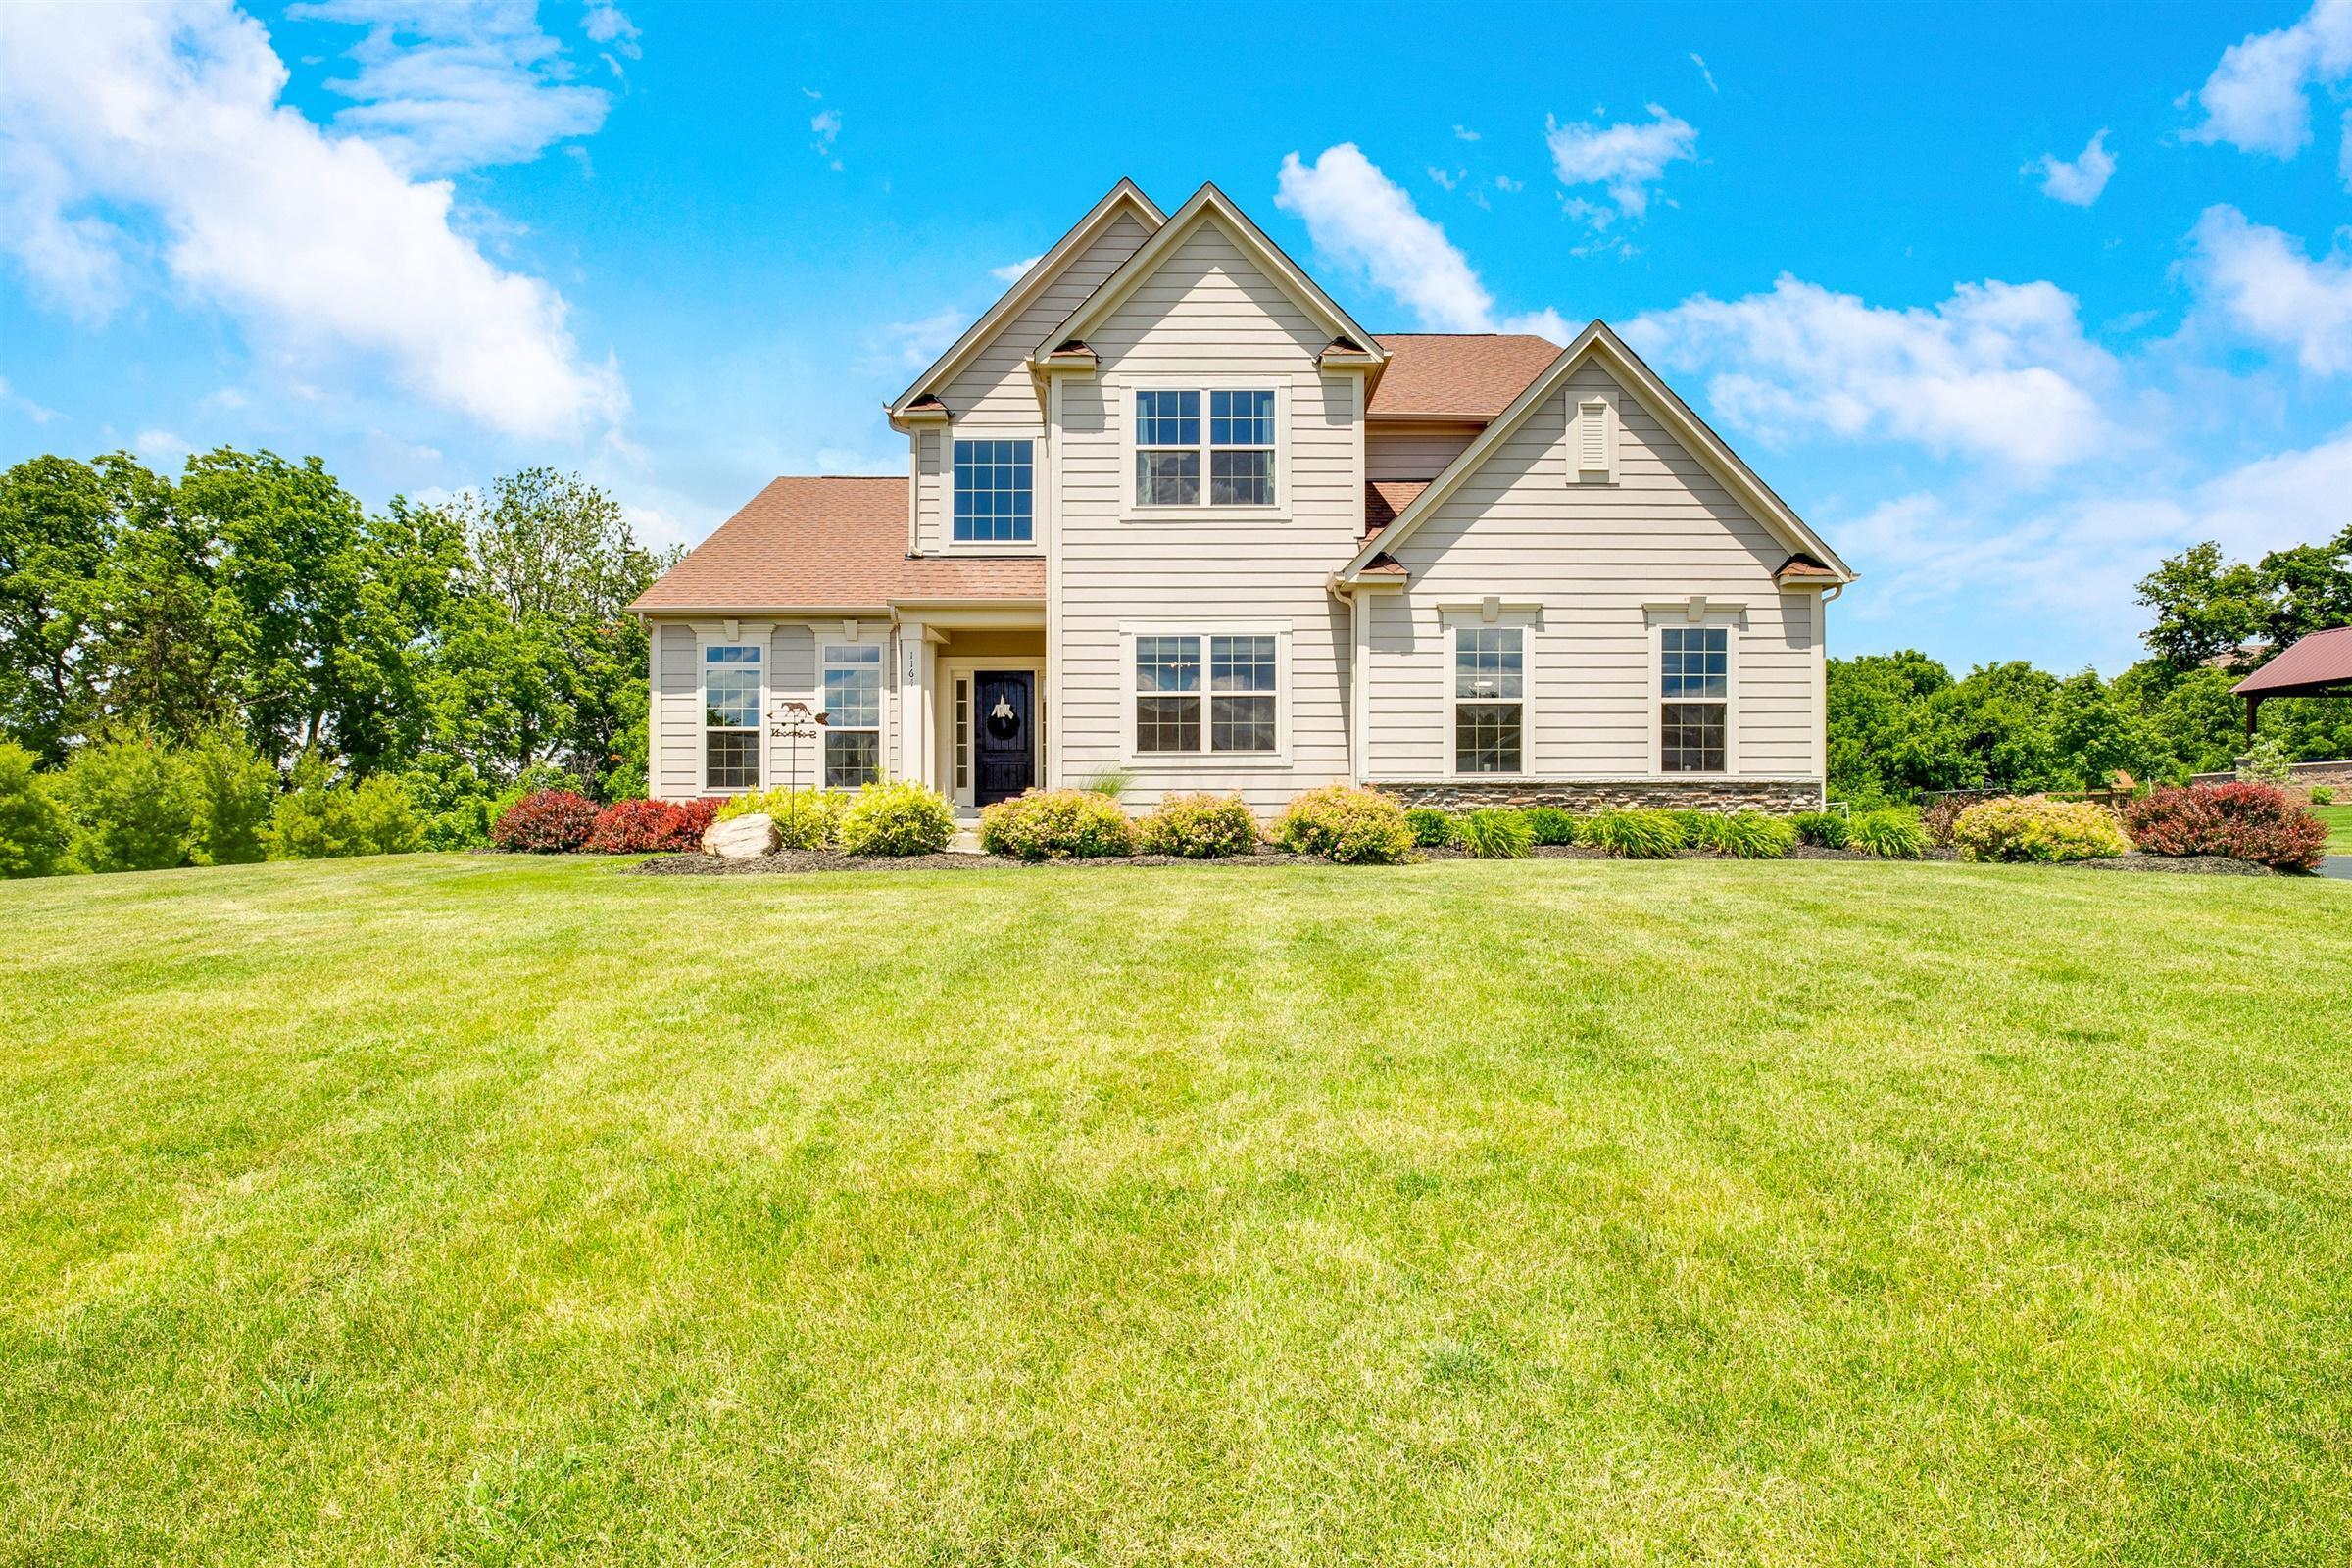 1164 Rambling Brook Way, Delaware, Ohio 43015, 4 Bedrooms Bedrooms, ,3 BathroomsBathrooms,Residential,For Sale,Rambling Brook,220020553